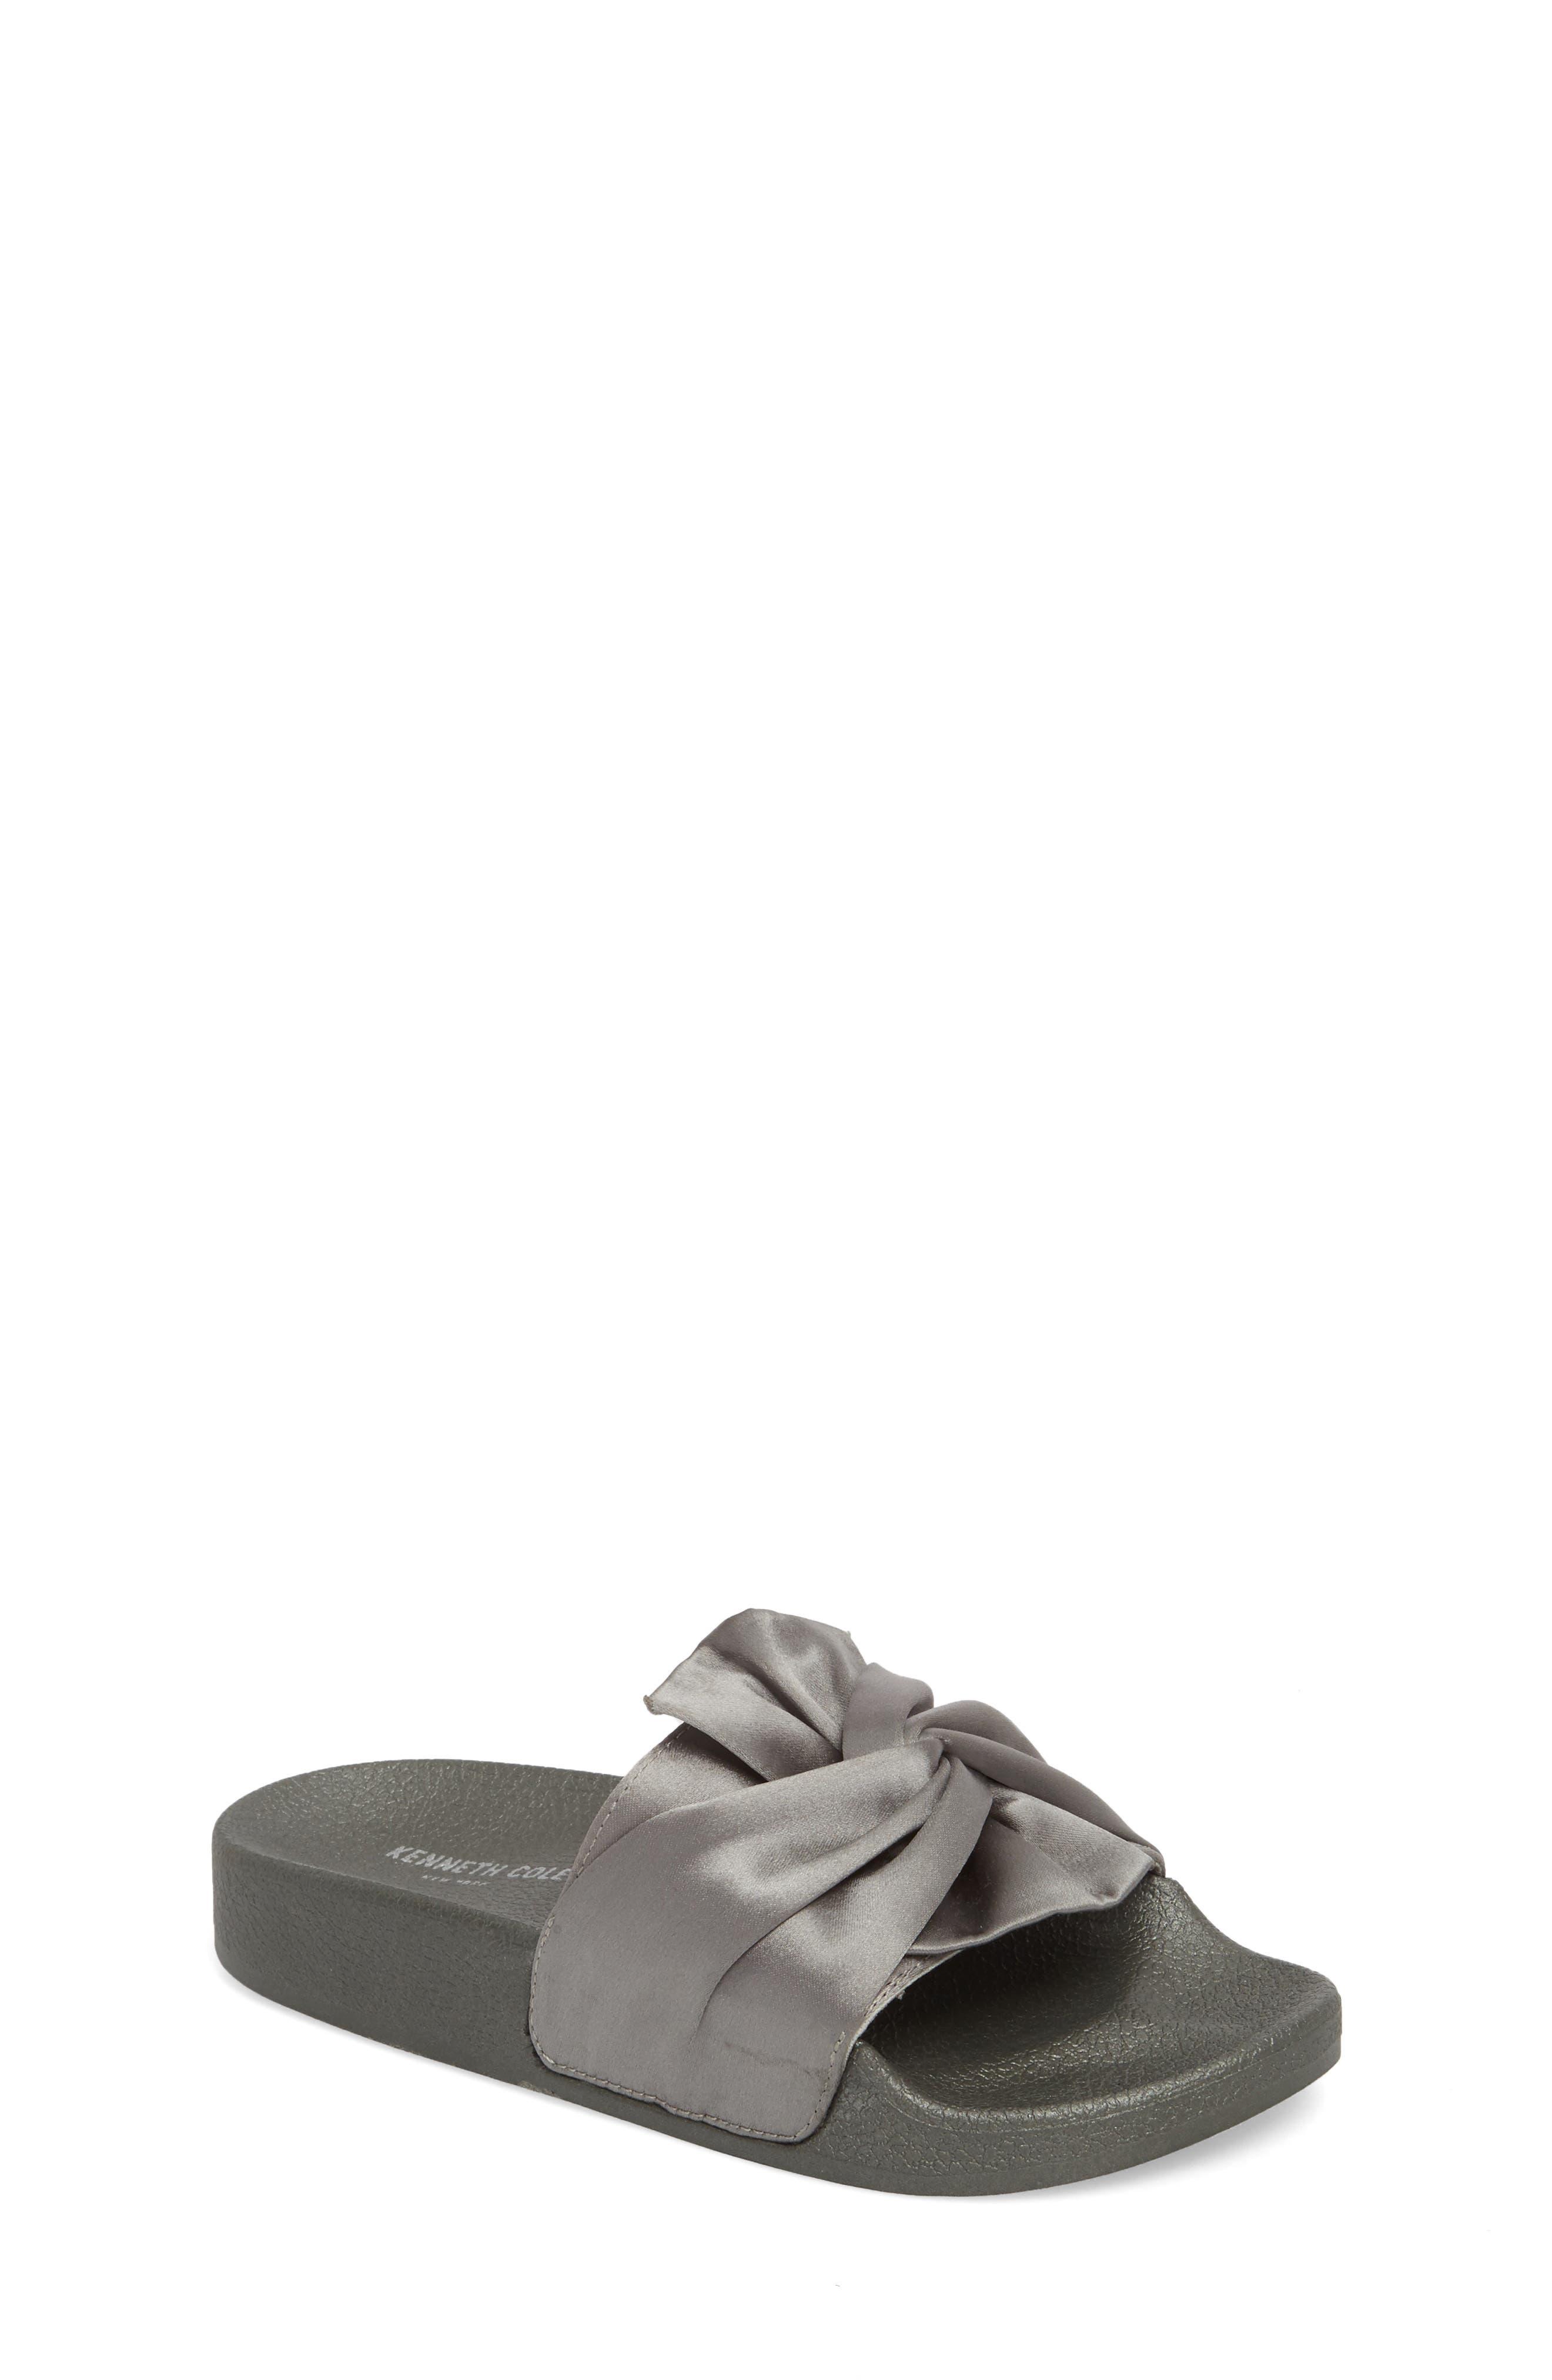 Shower Twist Slide Sandal,                             Main thumbnail 1, color,                             Gray